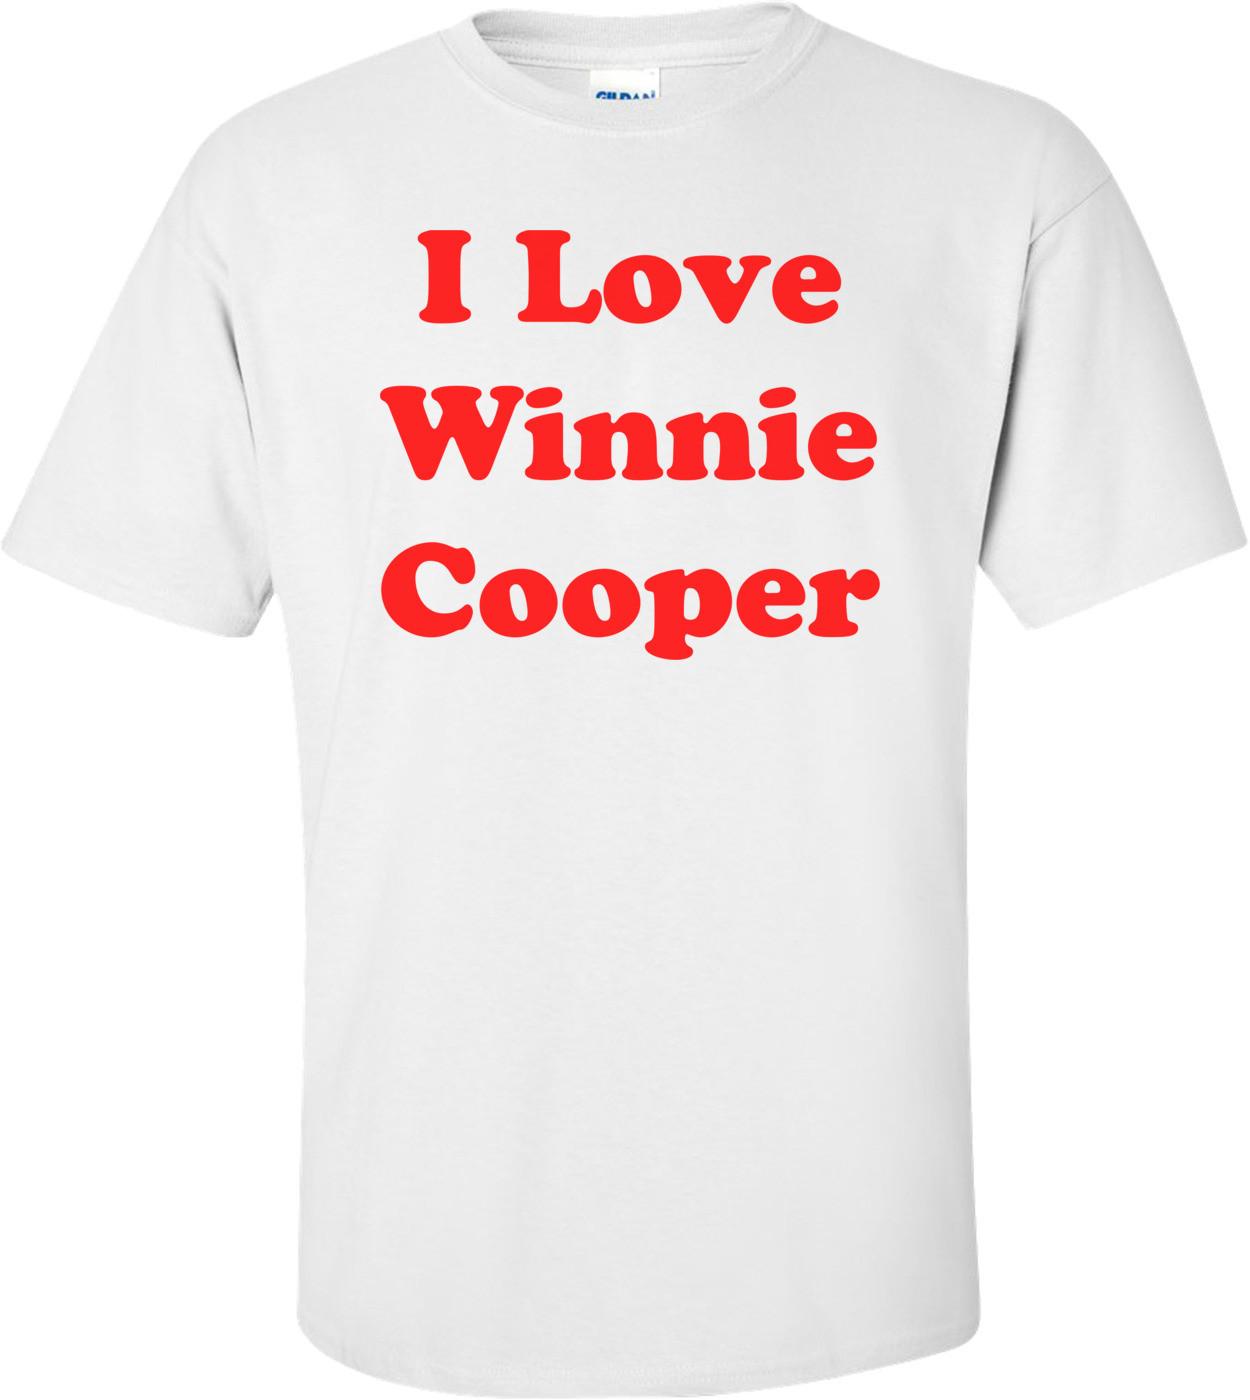 I Love Winnie Cooper Shirt